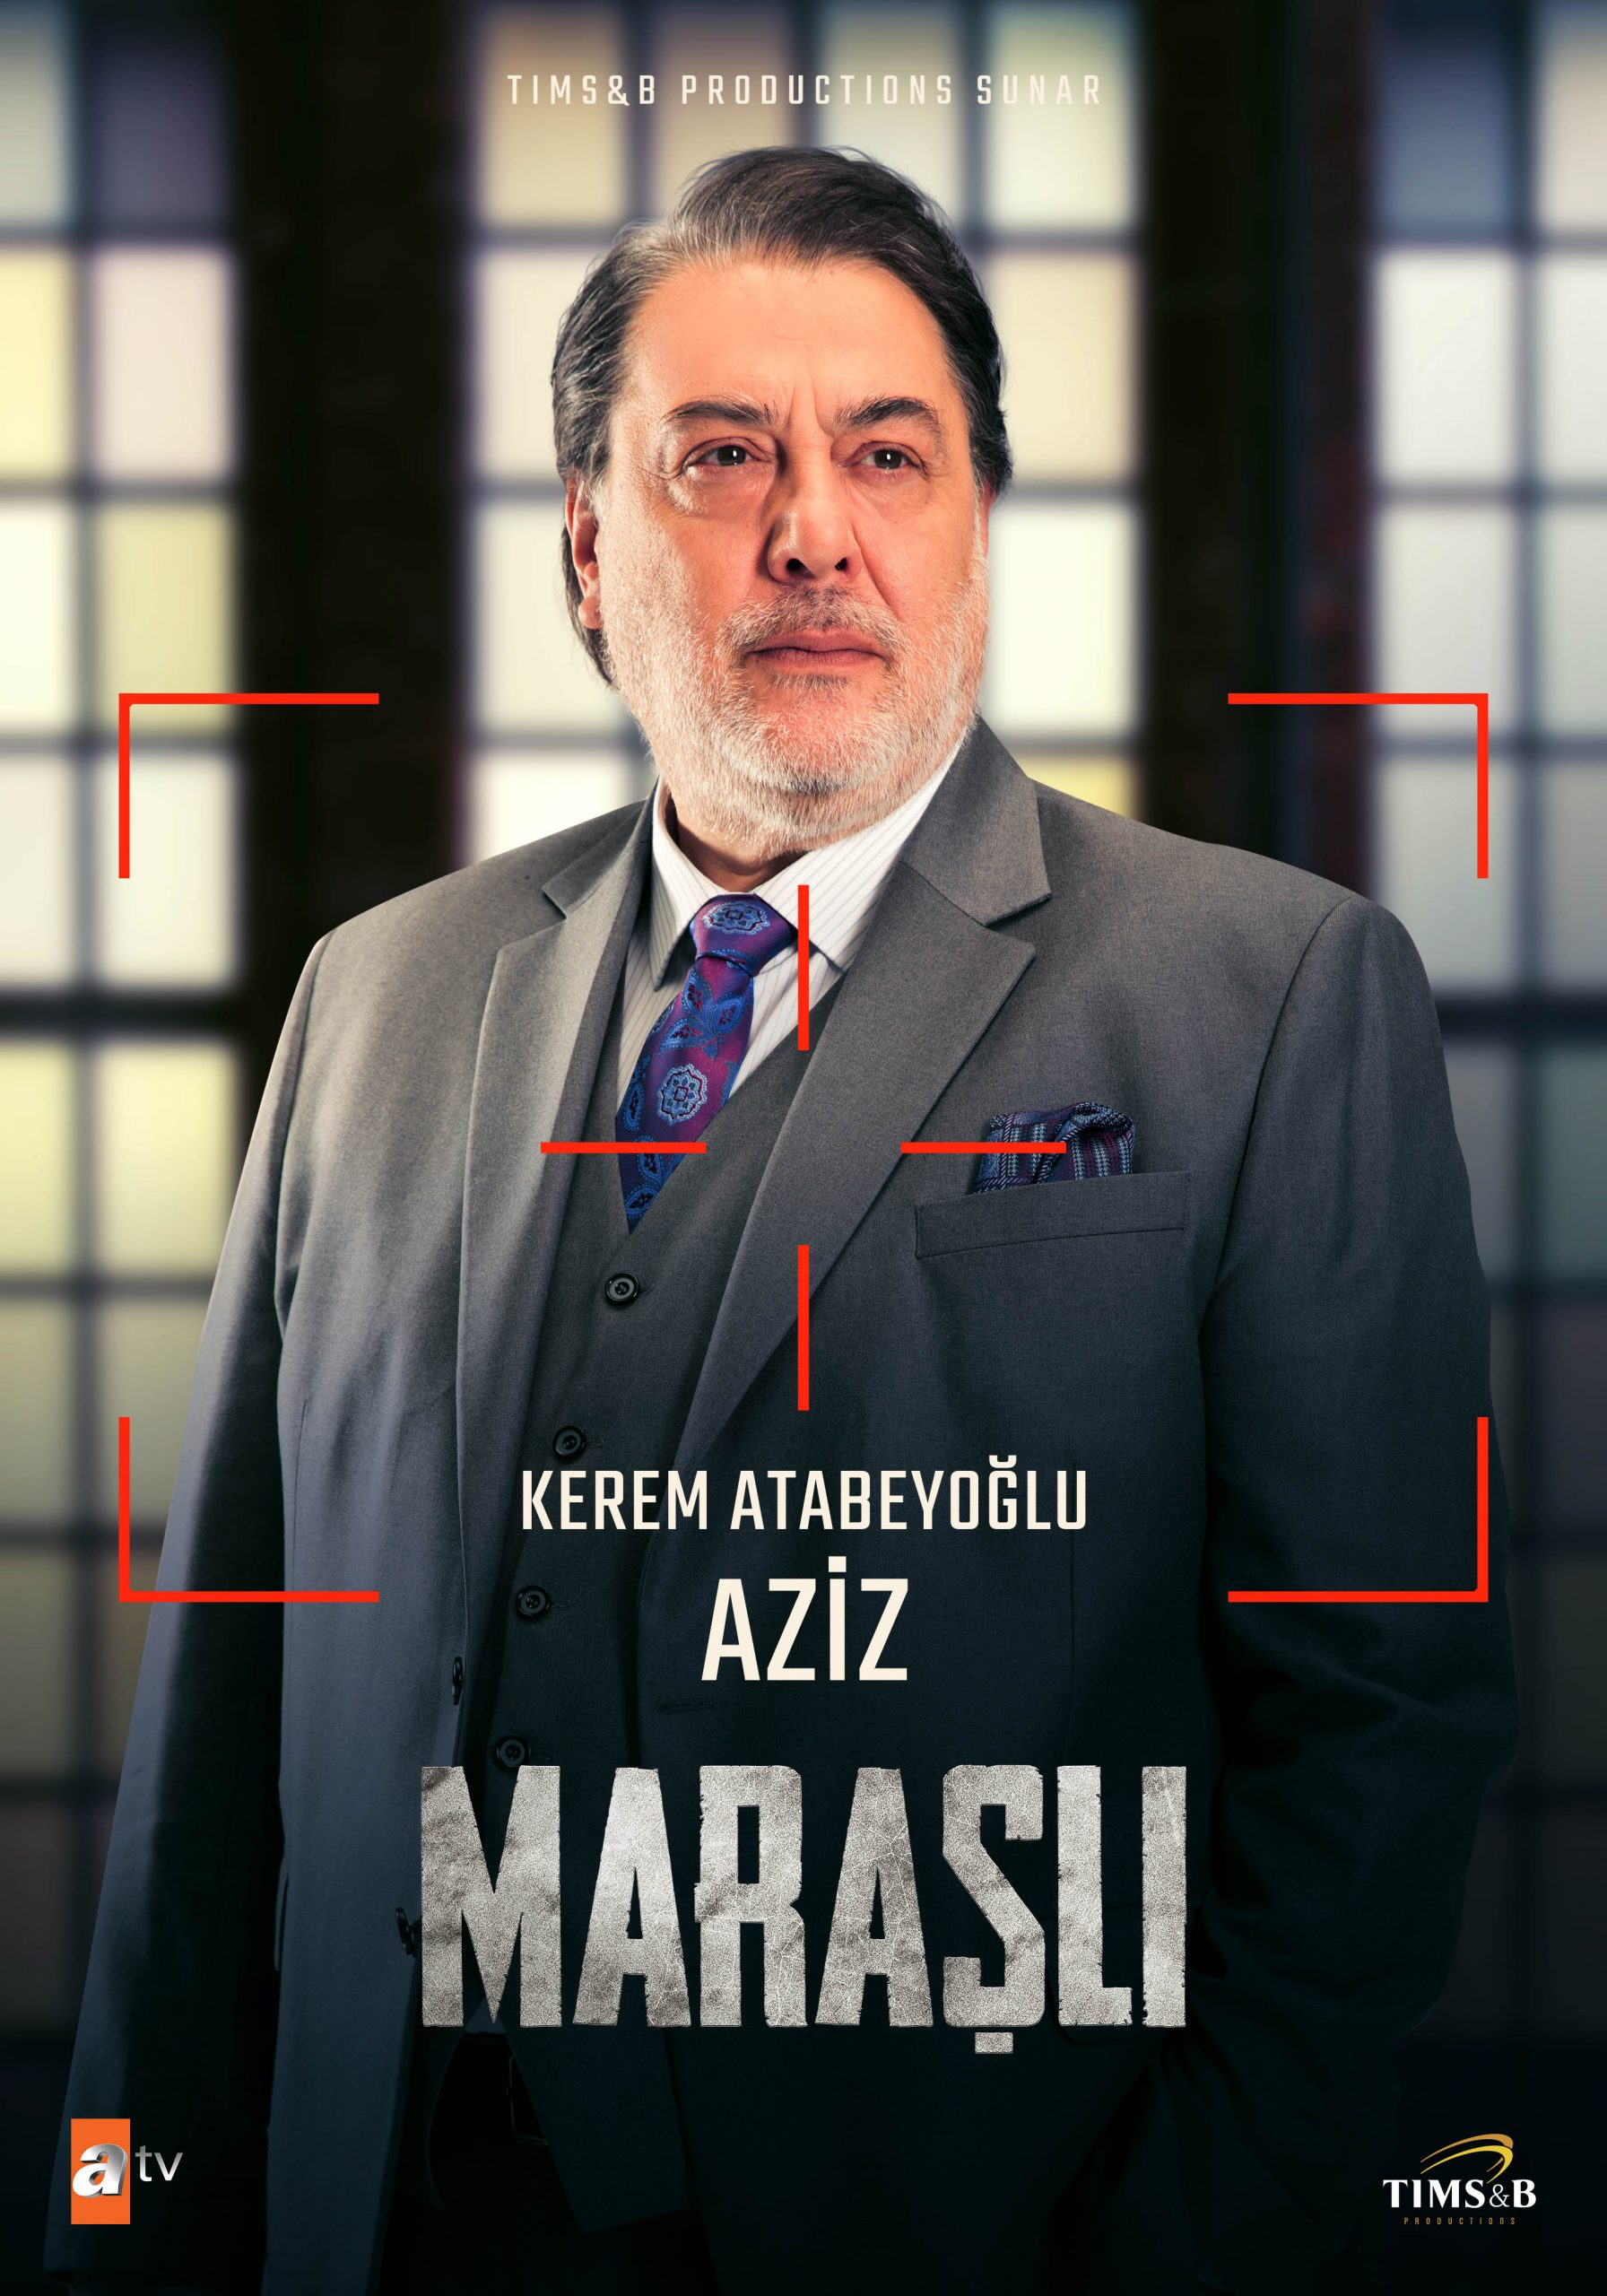 MARASLI_K_AZIZ_M-scaled